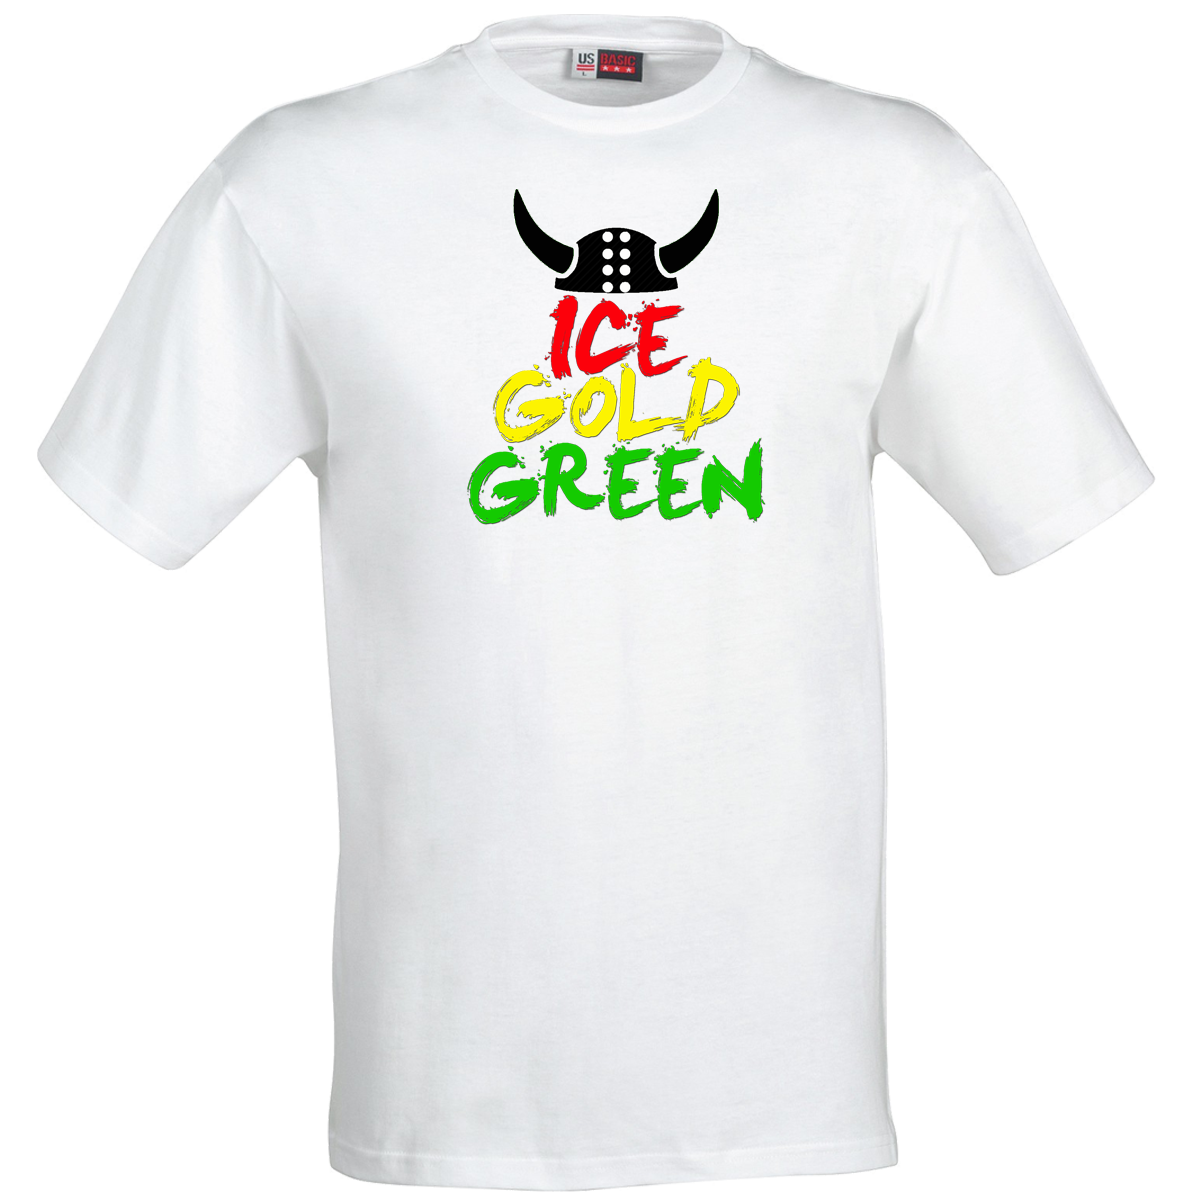 IGG T-SHIRT